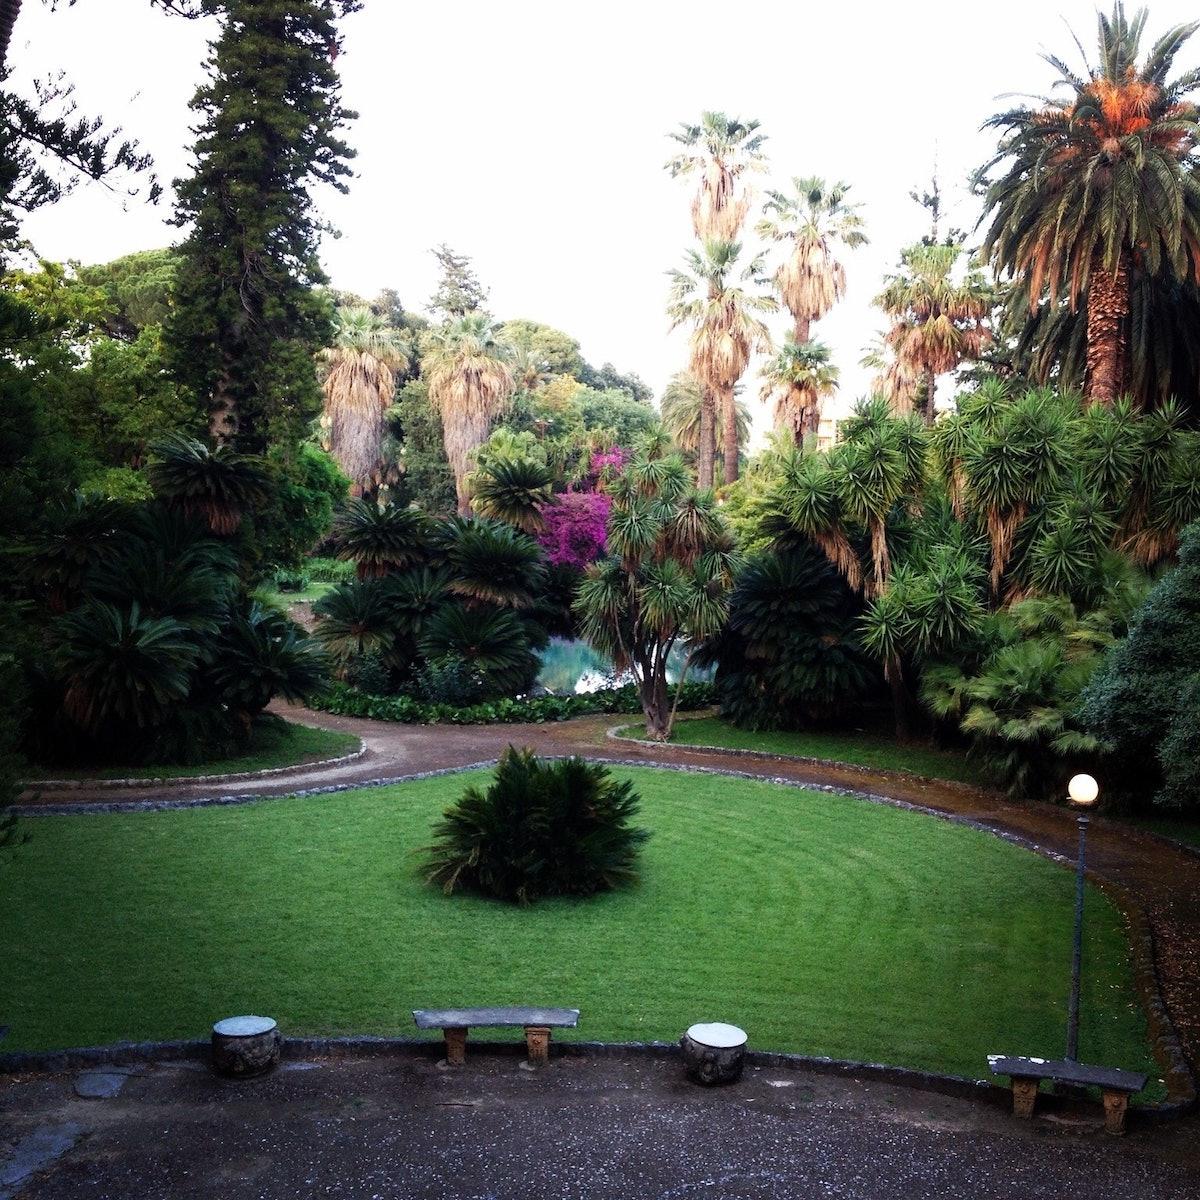 Villa Tasca Garden view.JPG